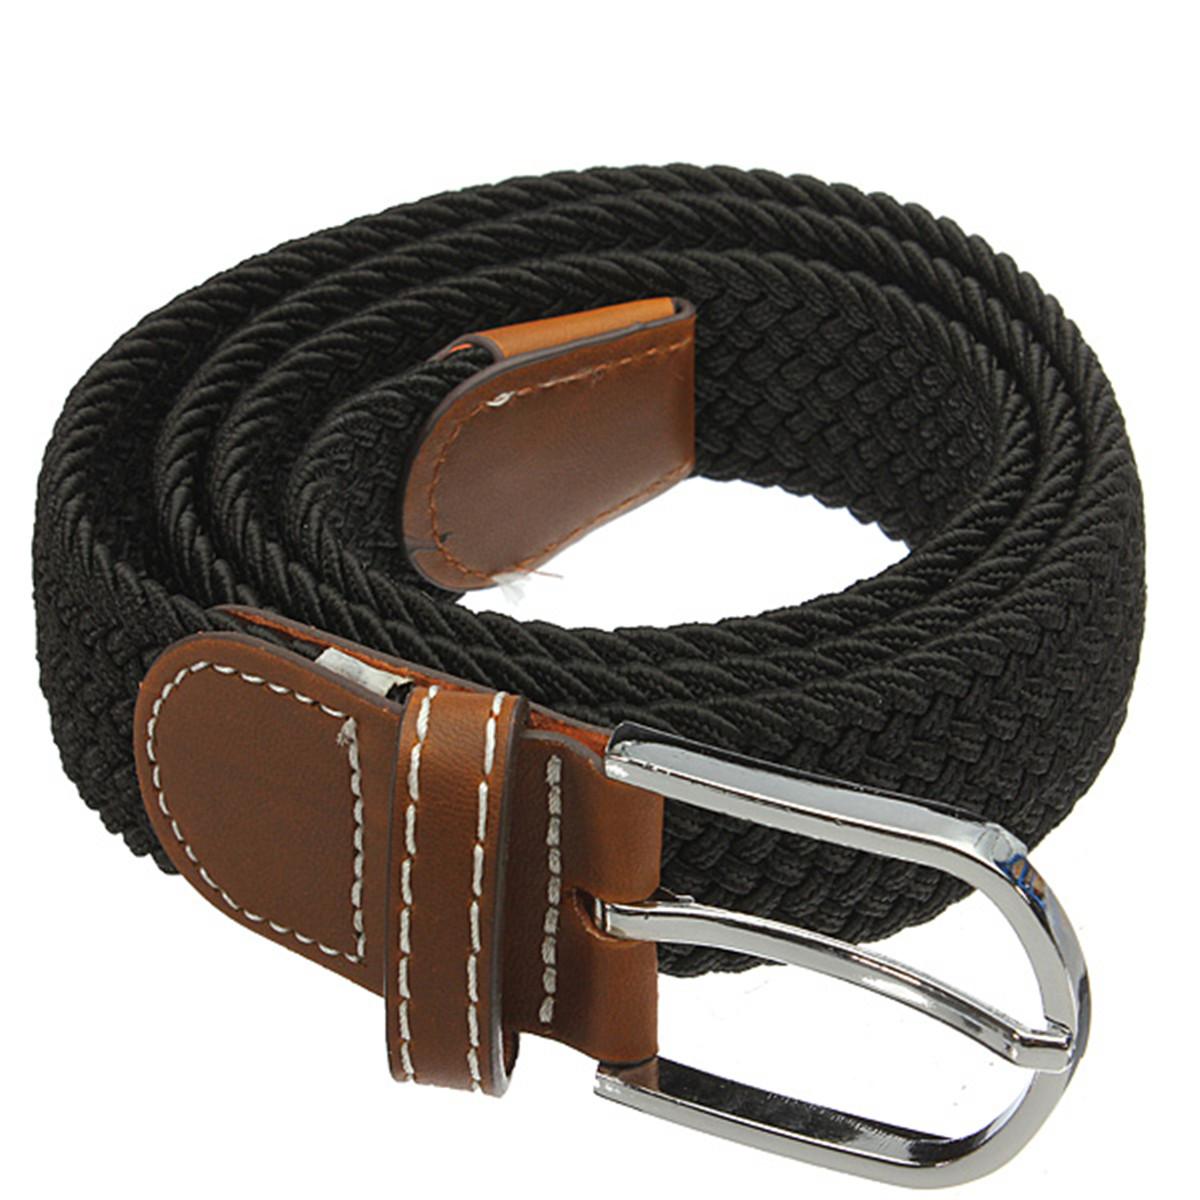 115cm Canvas Elastic Stretch Tactical Belt Men Women Pin Buckle Waist Belt Hunting Fishing